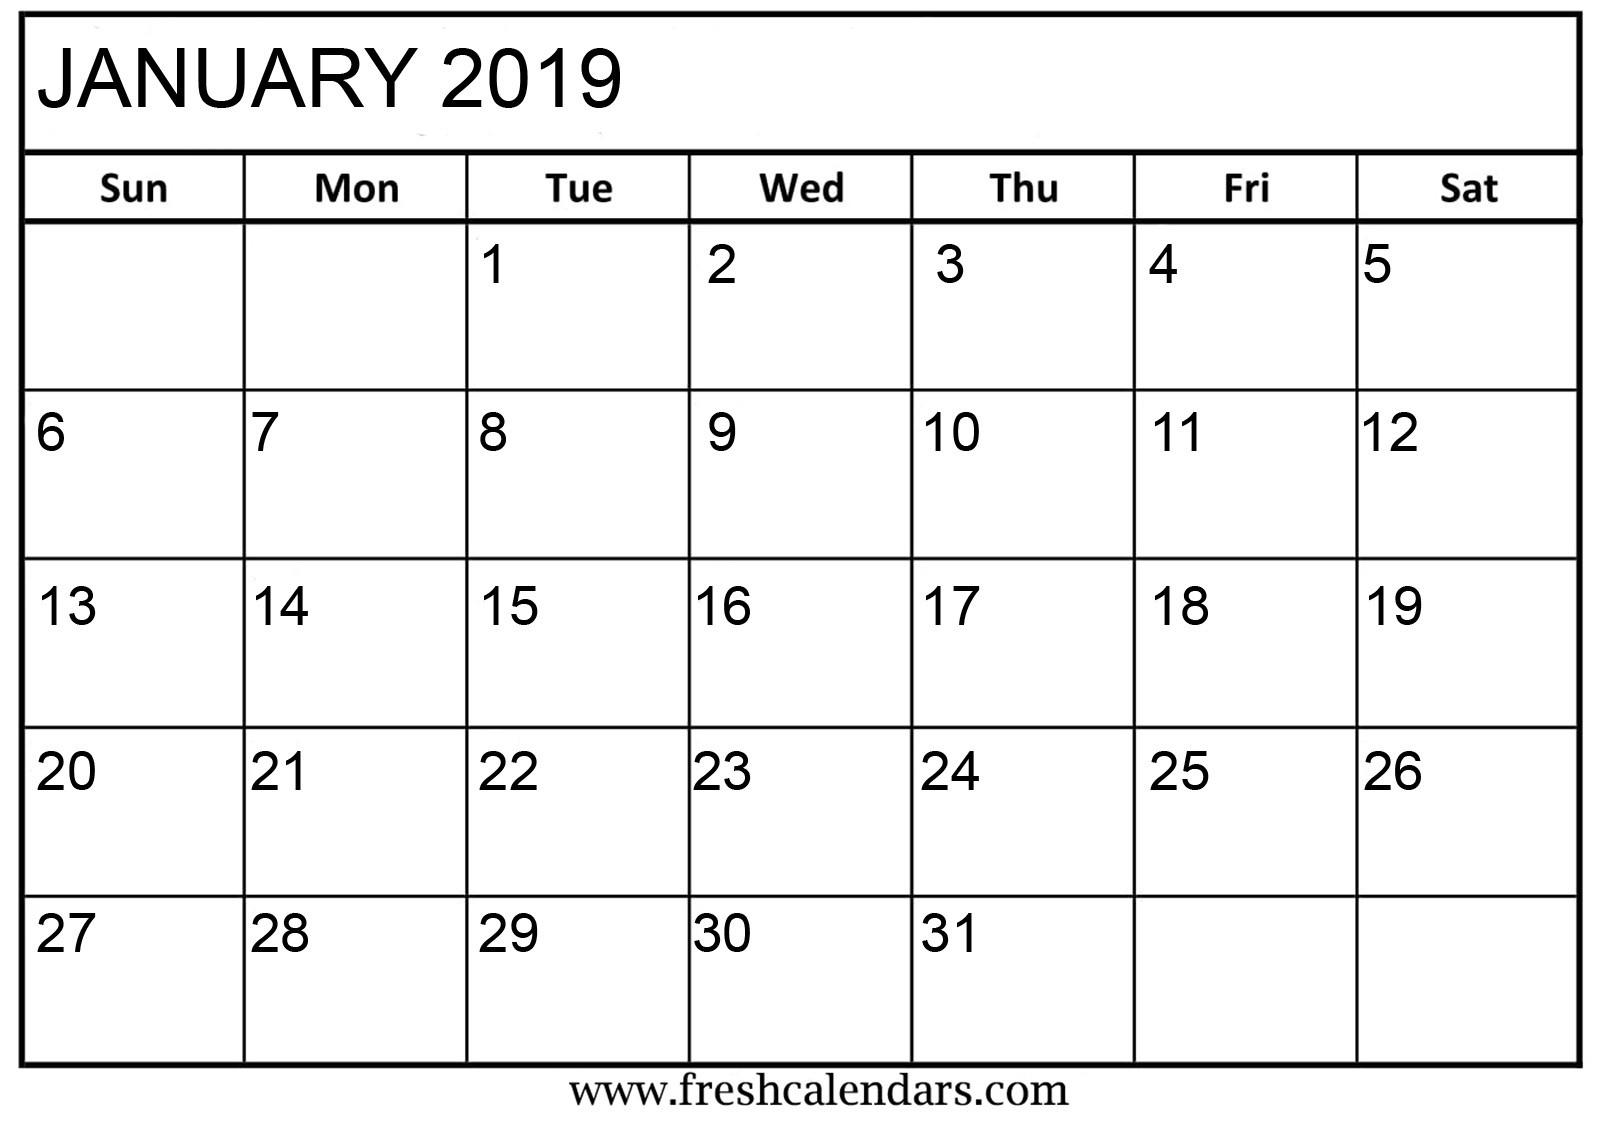 Printable January 2019 Calendar Blank January 2019 Calendar Printable Templates